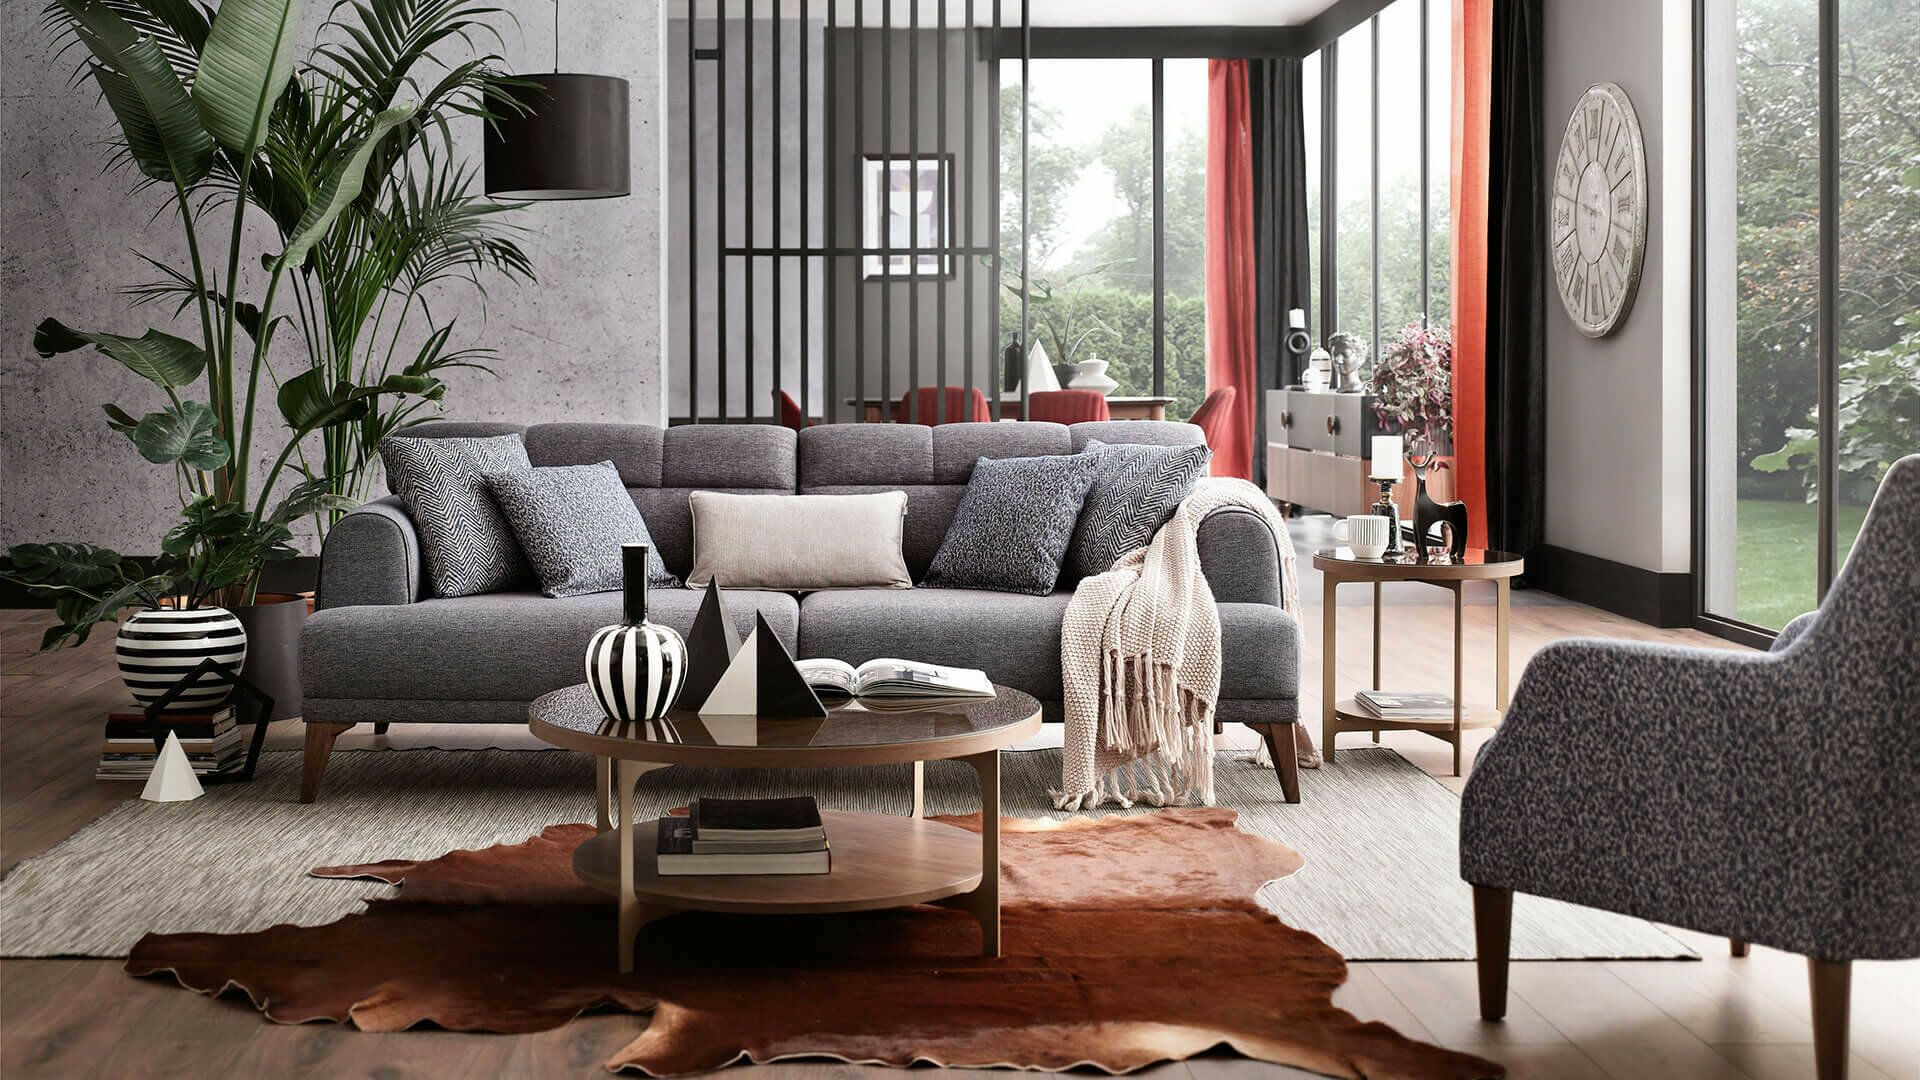 Dogtas Madrid Uclu Yatakli Koltuk Mobilya Decoration Homedecoration Furniture 2020 Mobilya Fikirleri Mobilya Koltuklar